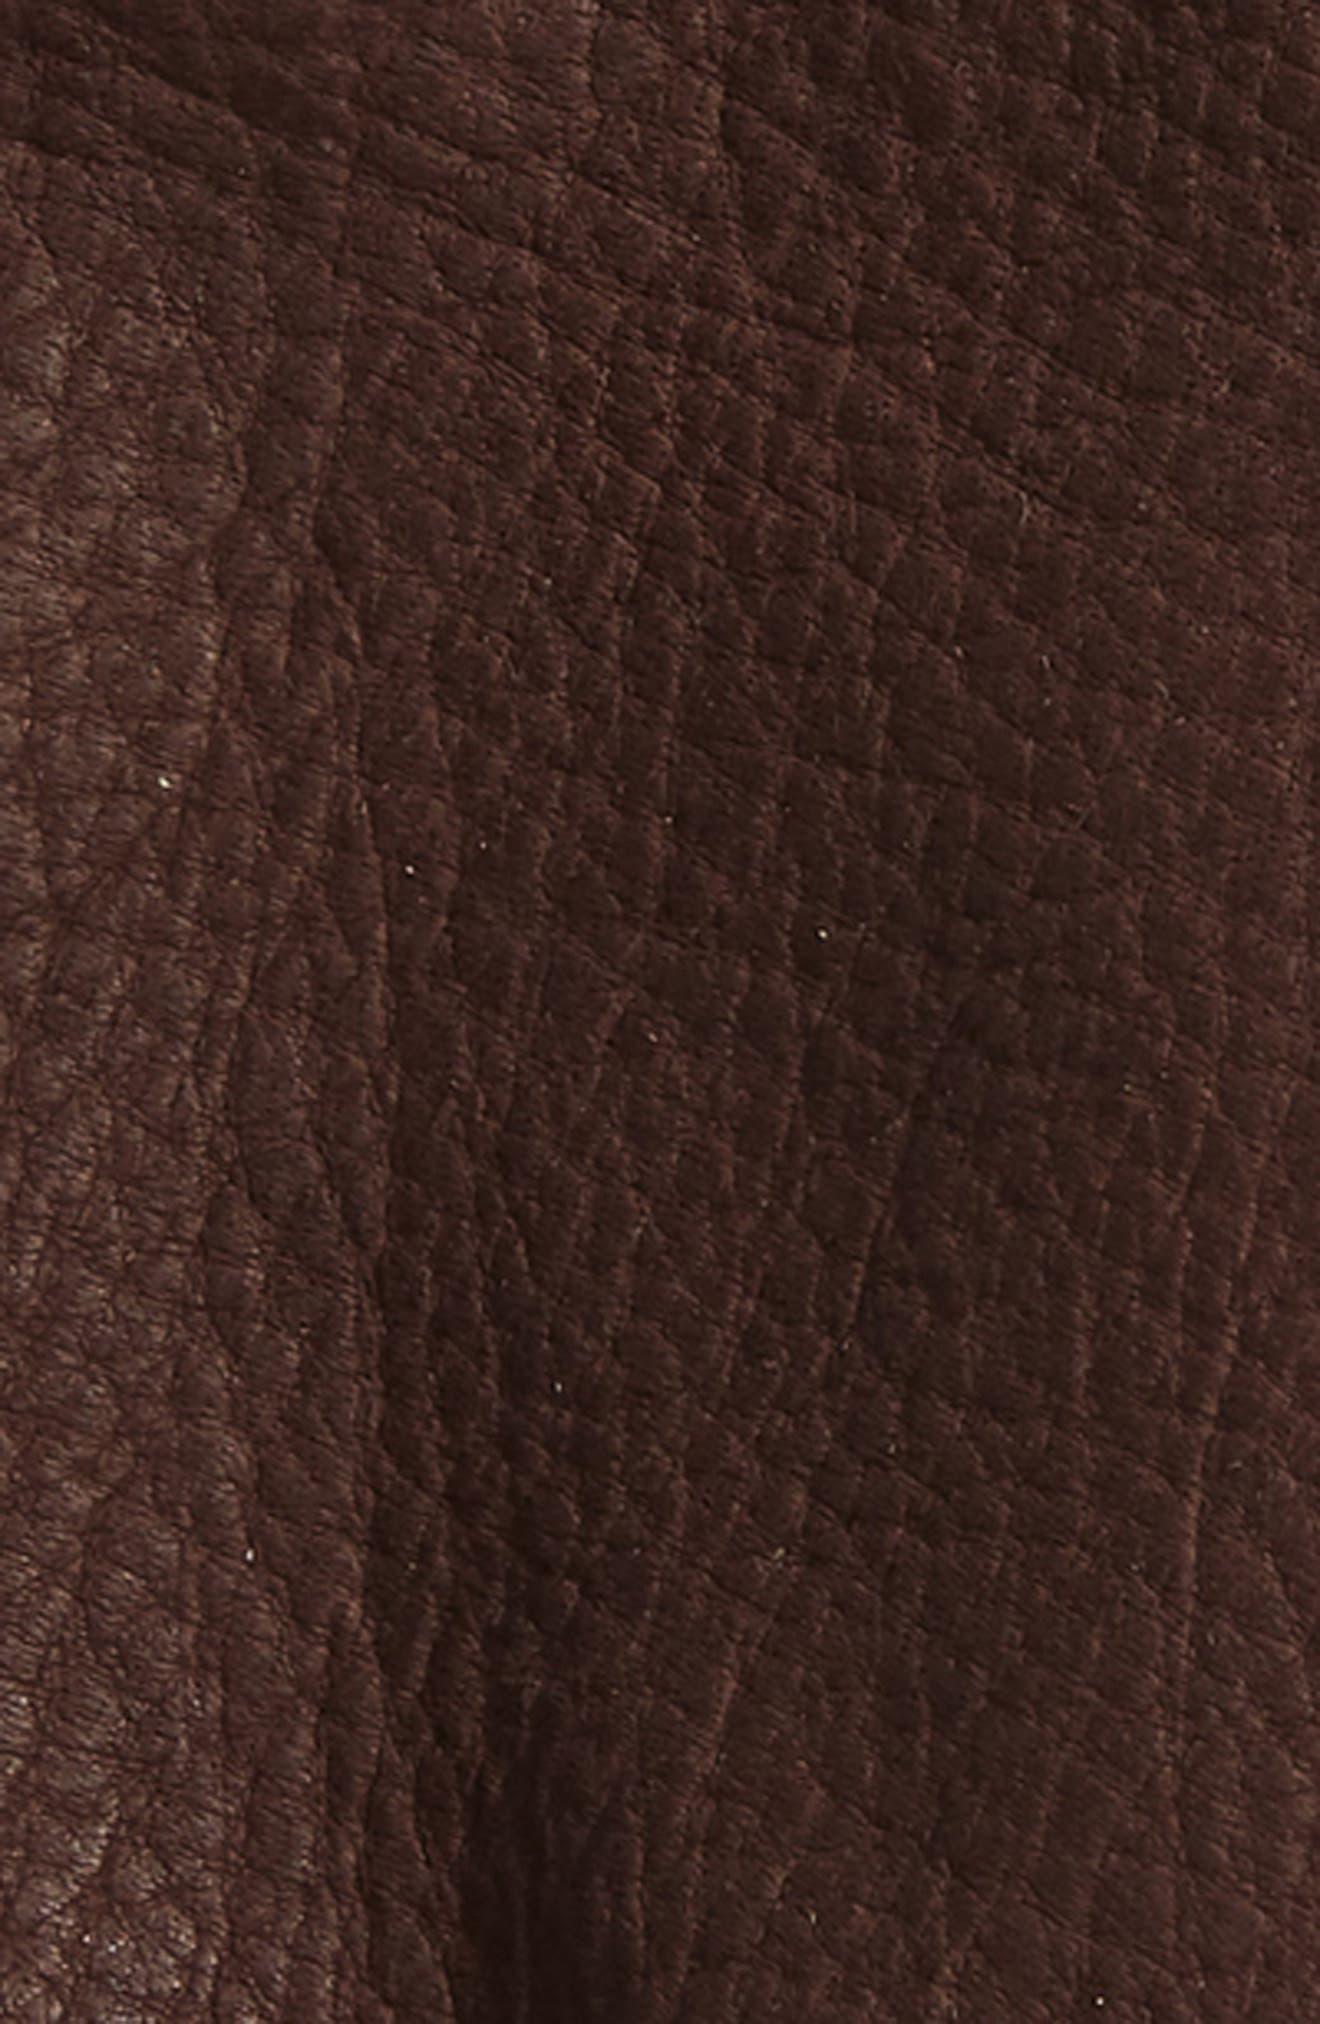 Roper Lined Deerskin Gloves,                             Alternate thumbnail 2, color,                             CHOCOLATE